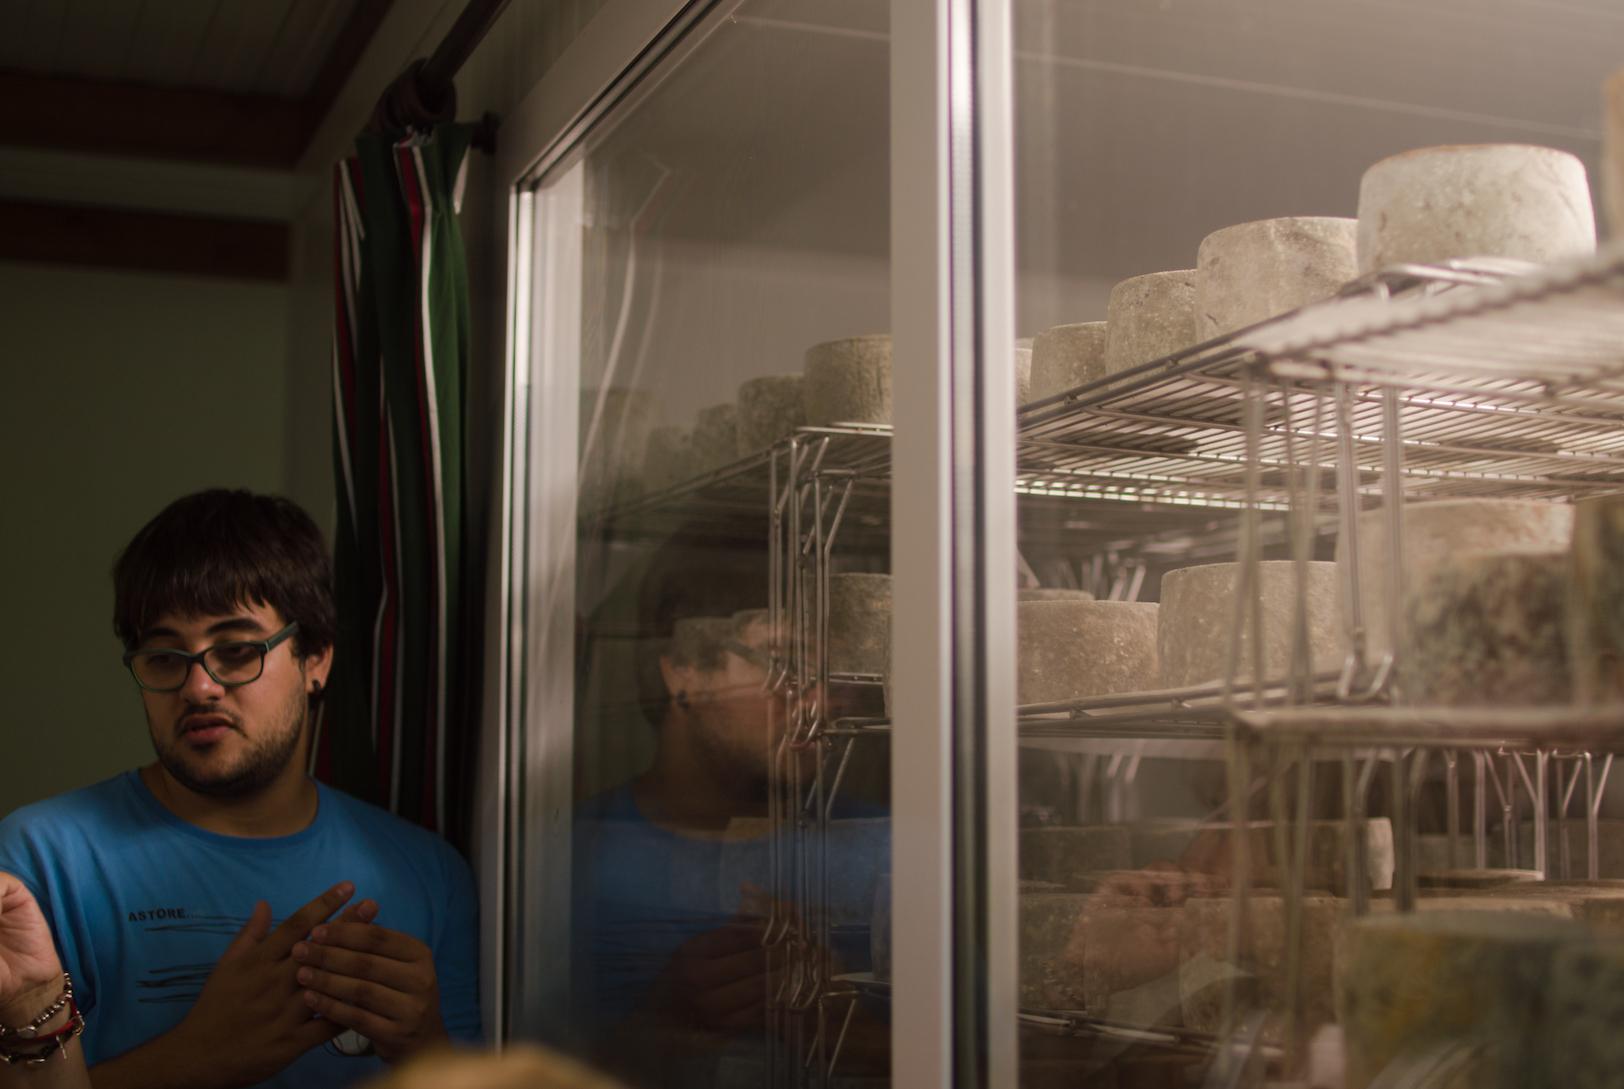 Cómo curan quesos en Queseria Kortariko Gasna